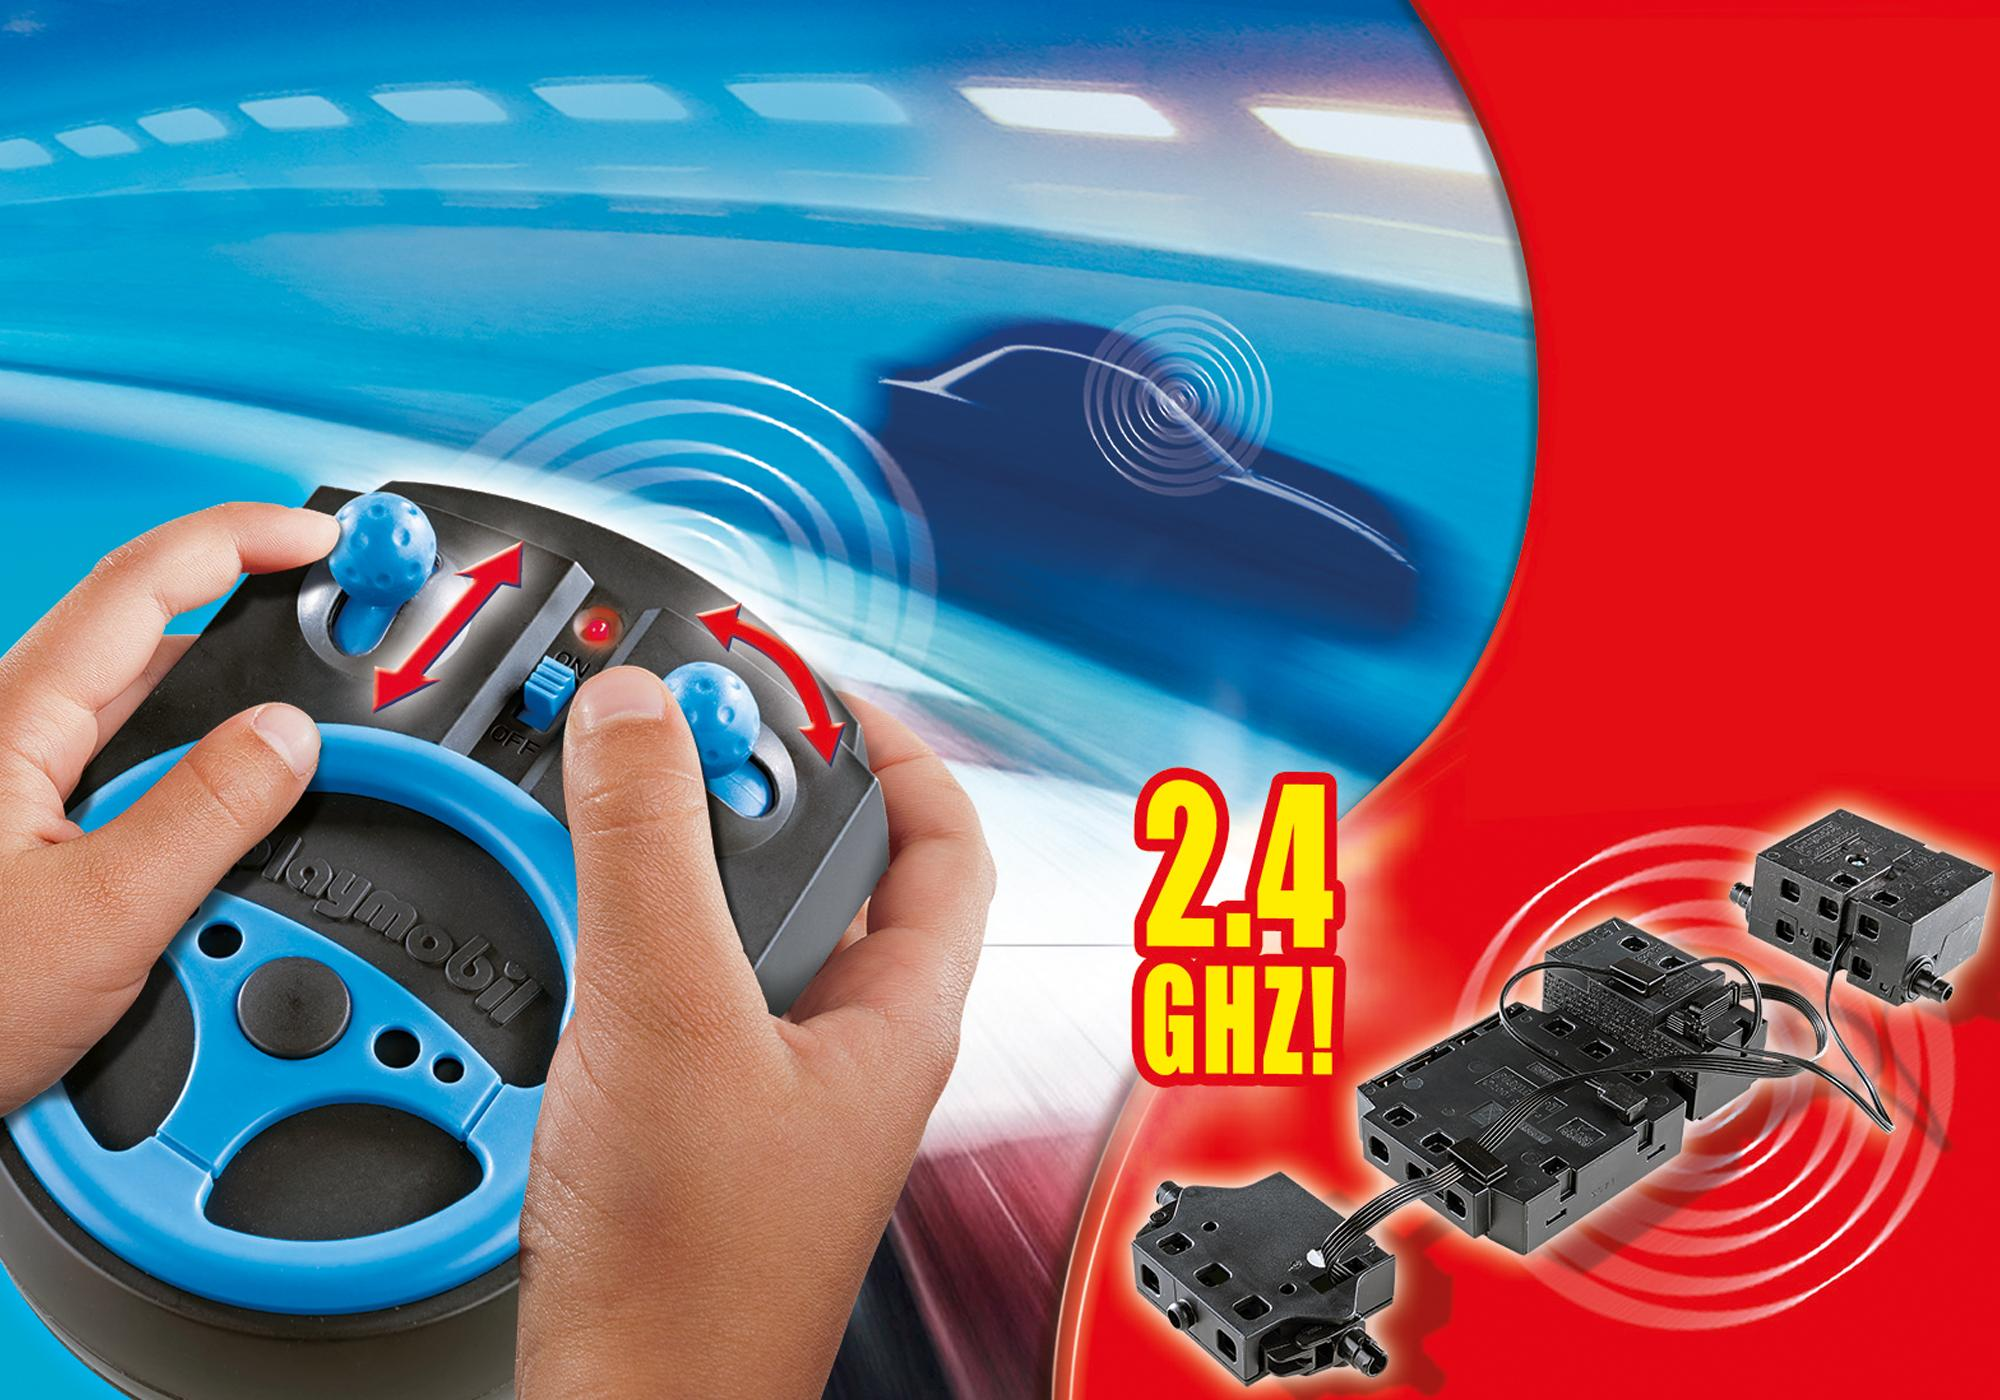 http://media.playmobil.com/i/playmobil/6914_product_detail/RC-module 2,4 GHz